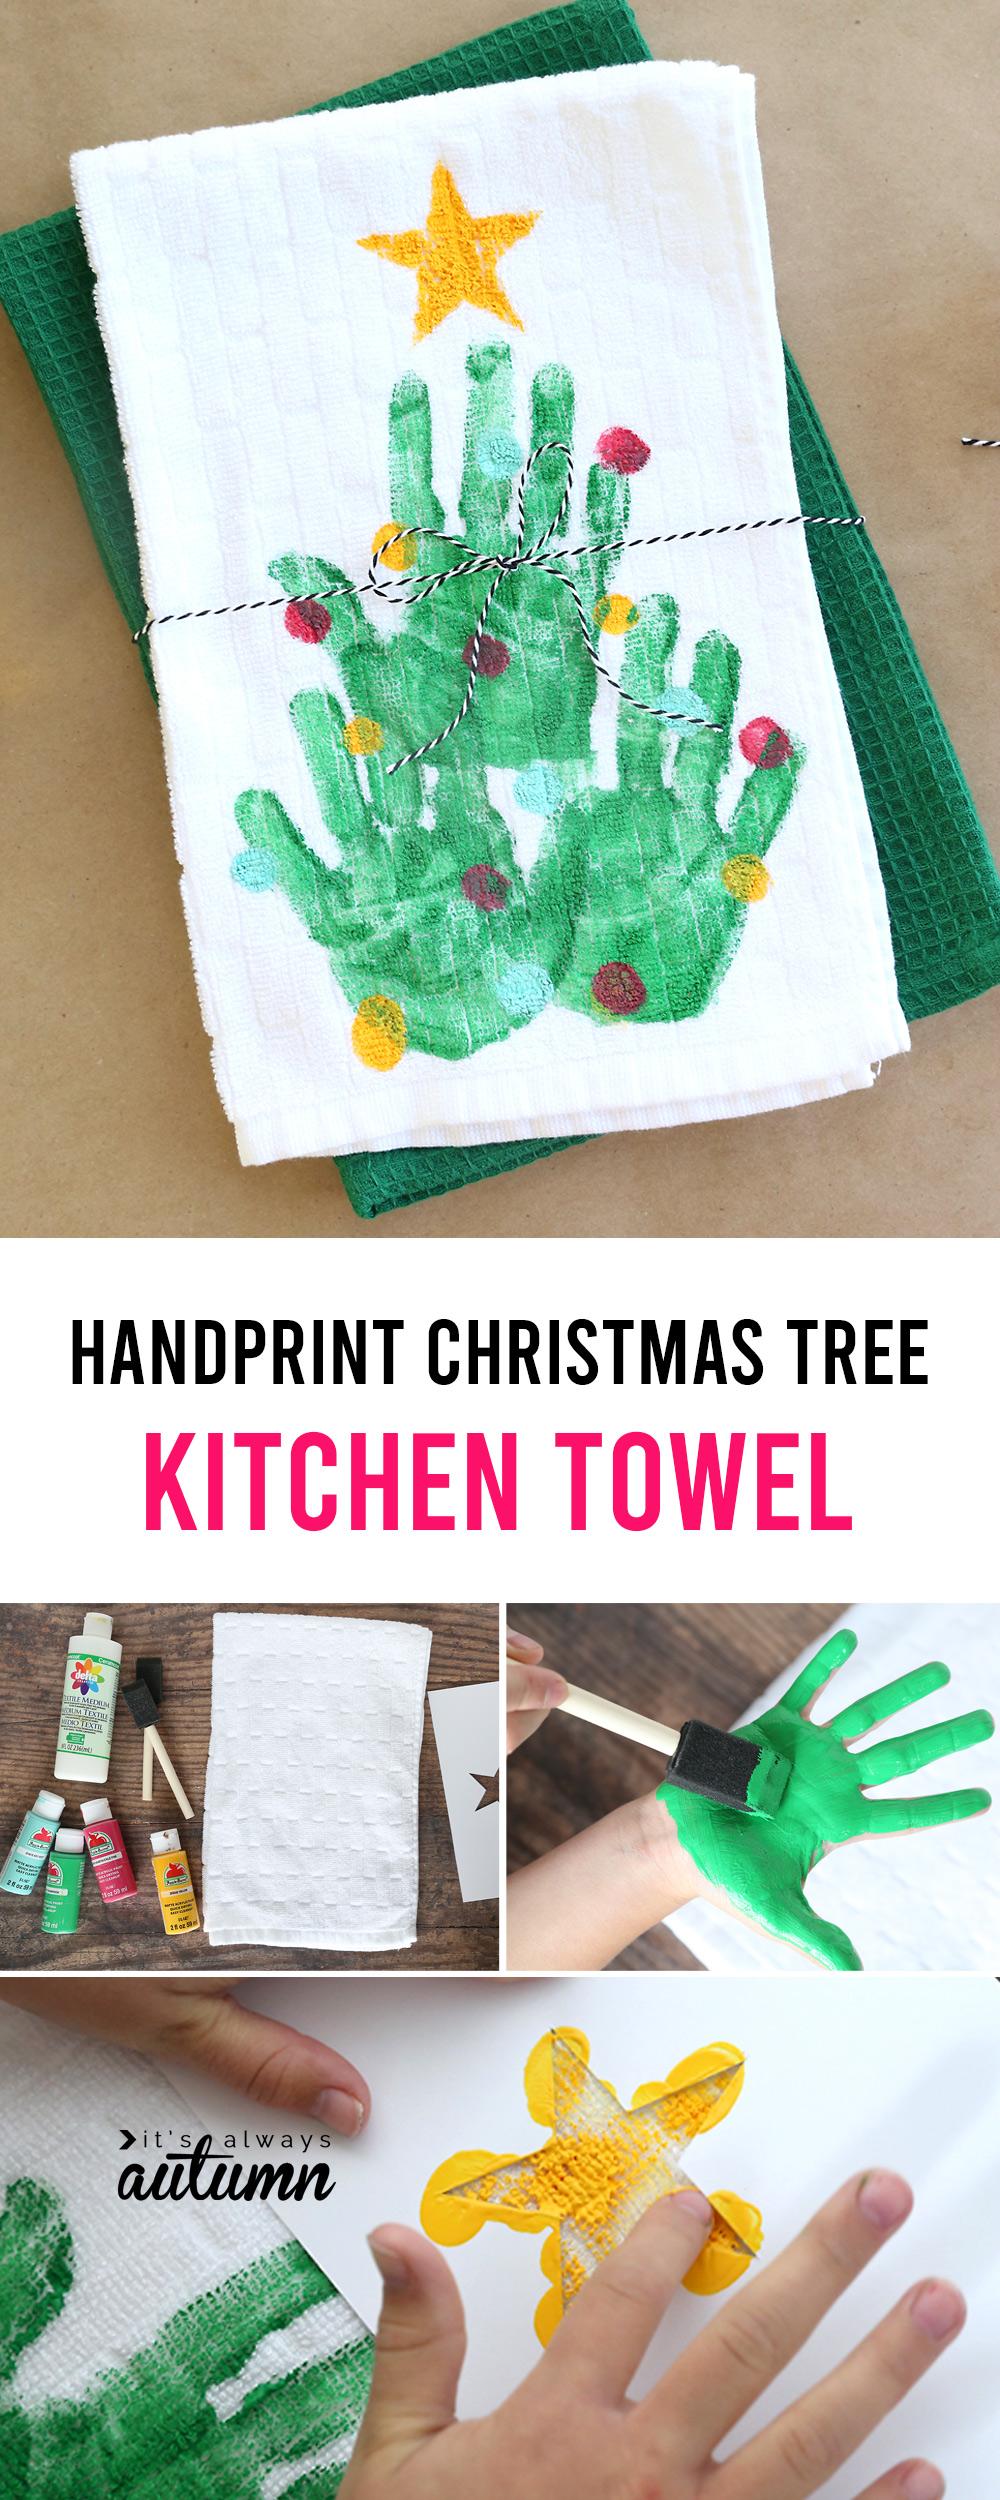 Handprint Christmas Tree Kitchen Towel Easy Diy Gift It S Always Autumn